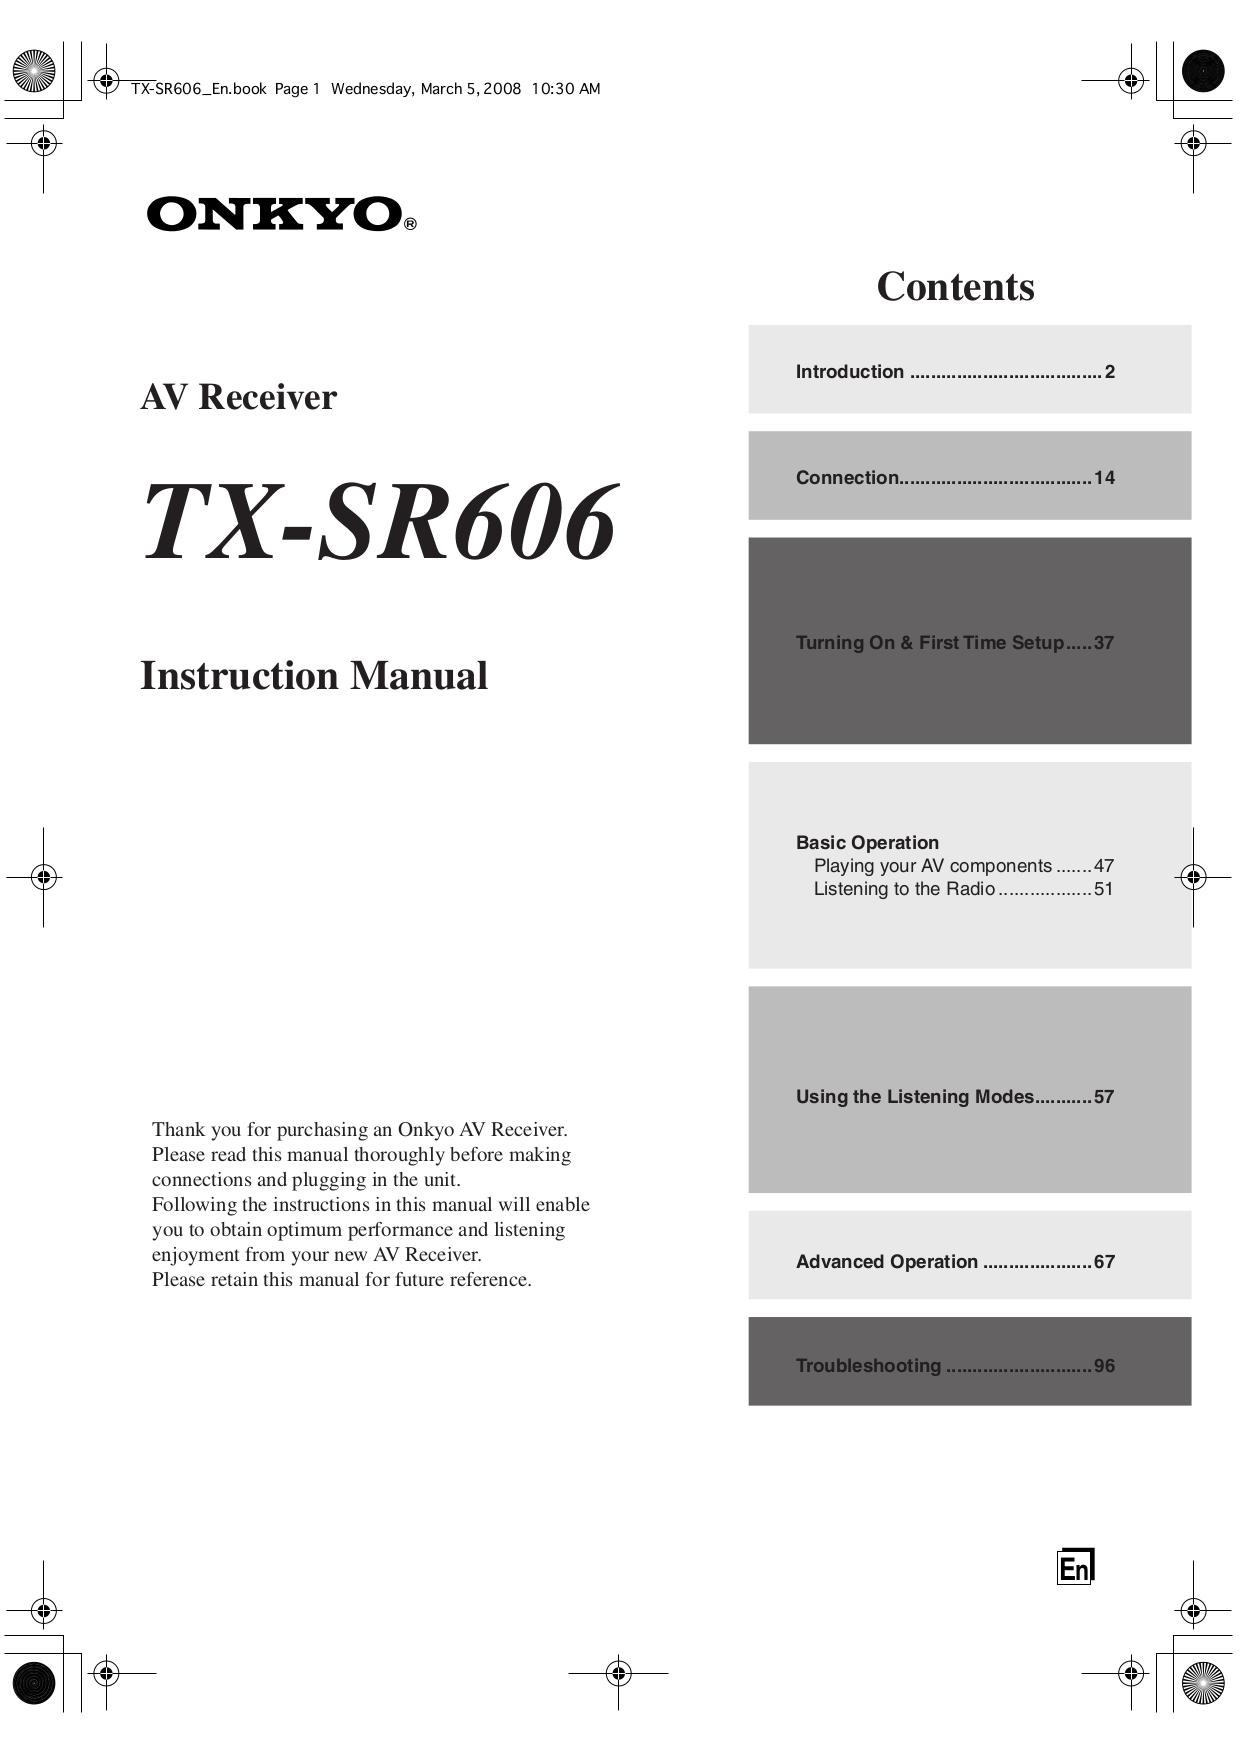 Onkyo Tx Sr606 Manual Pdf Wiring Diagram Schematic Diagrams